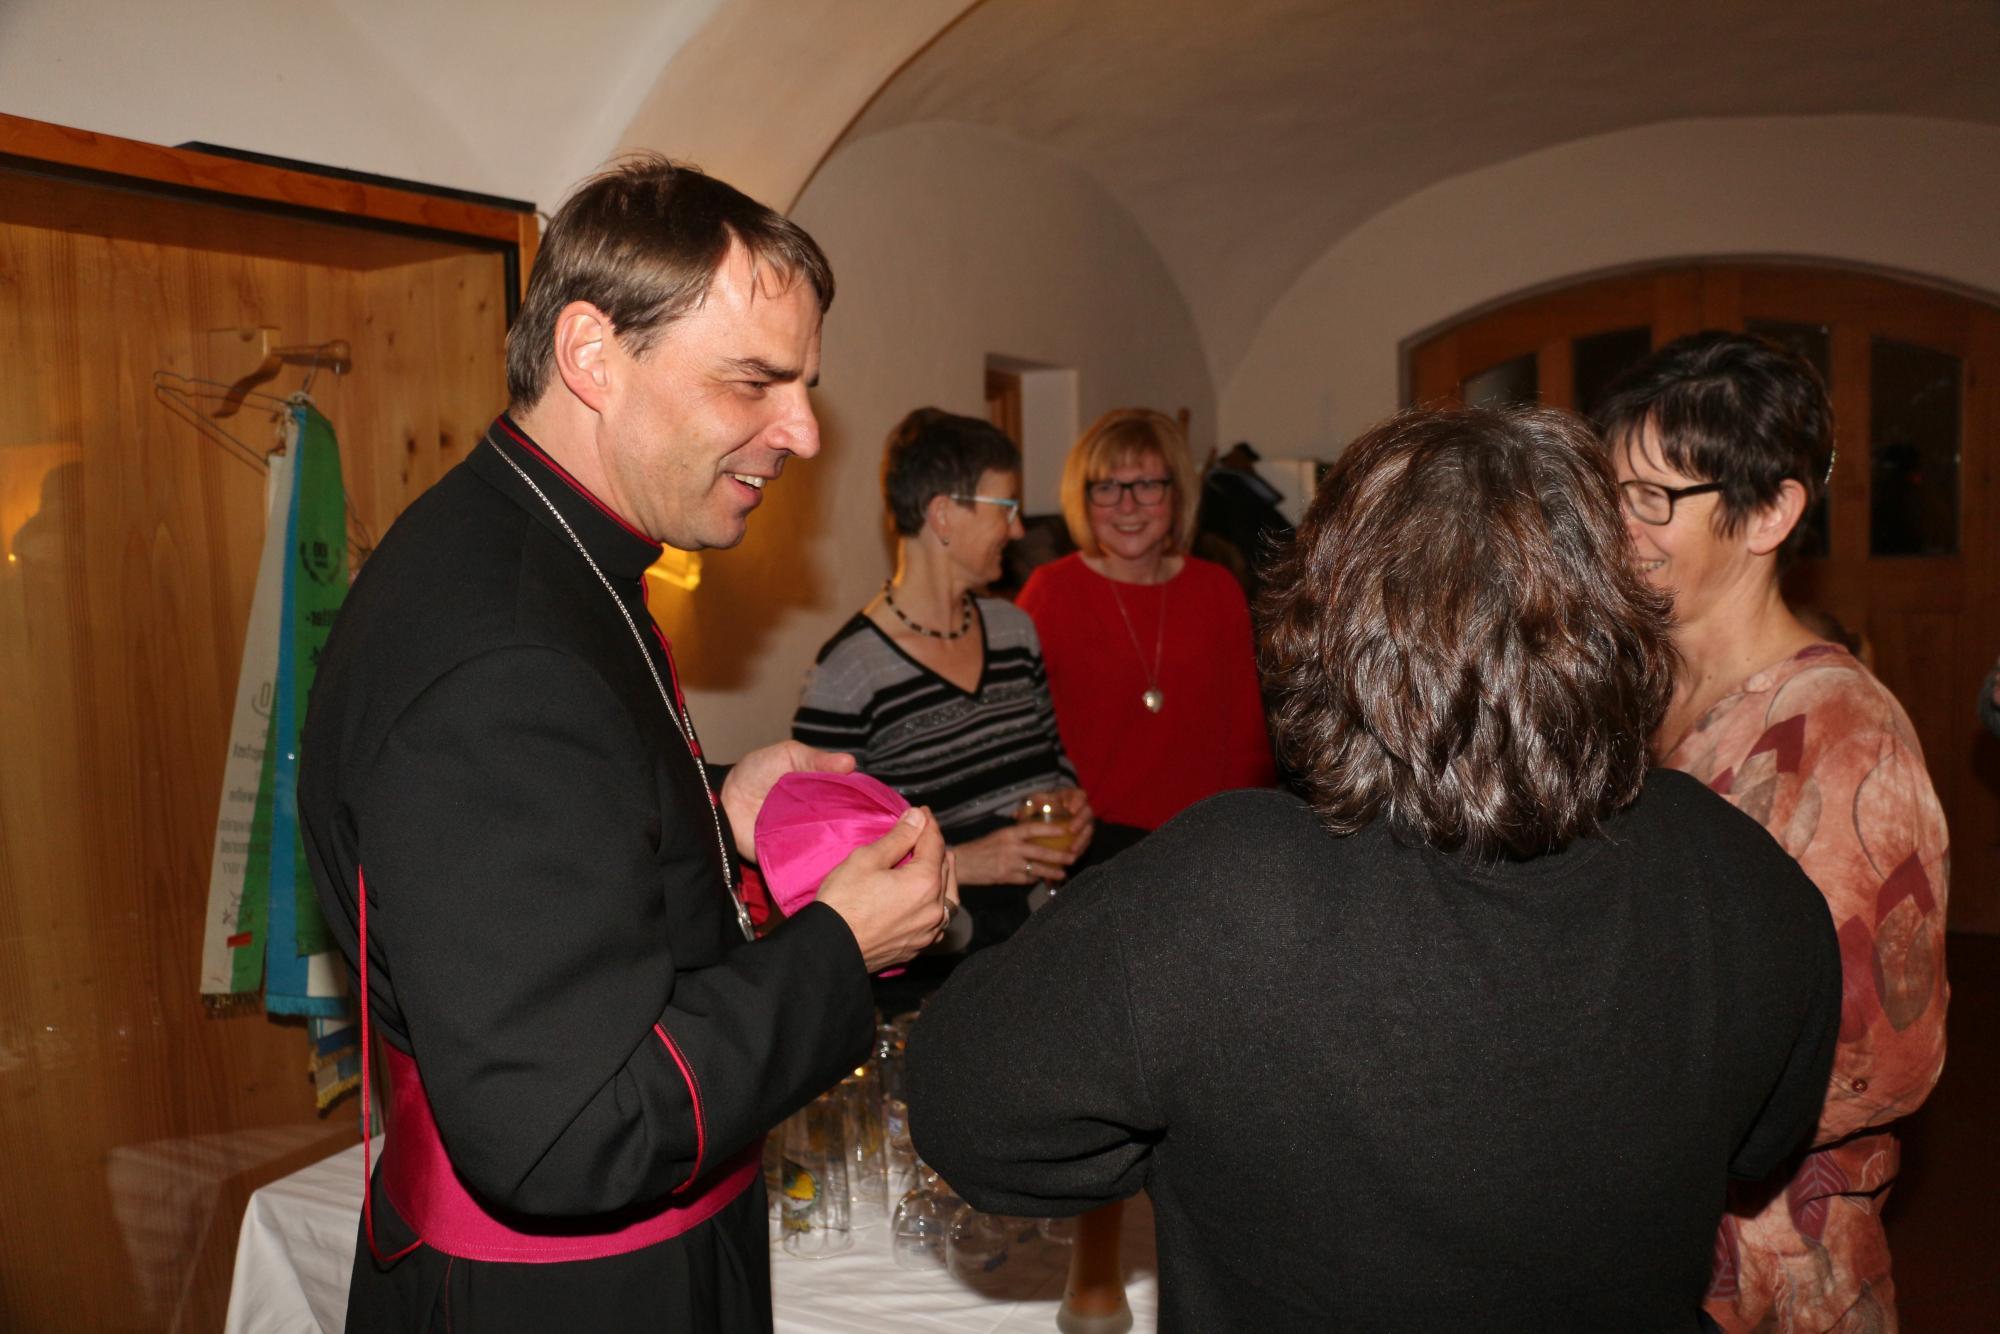 2019-visitation-bischof-kirchberg-7.jpg